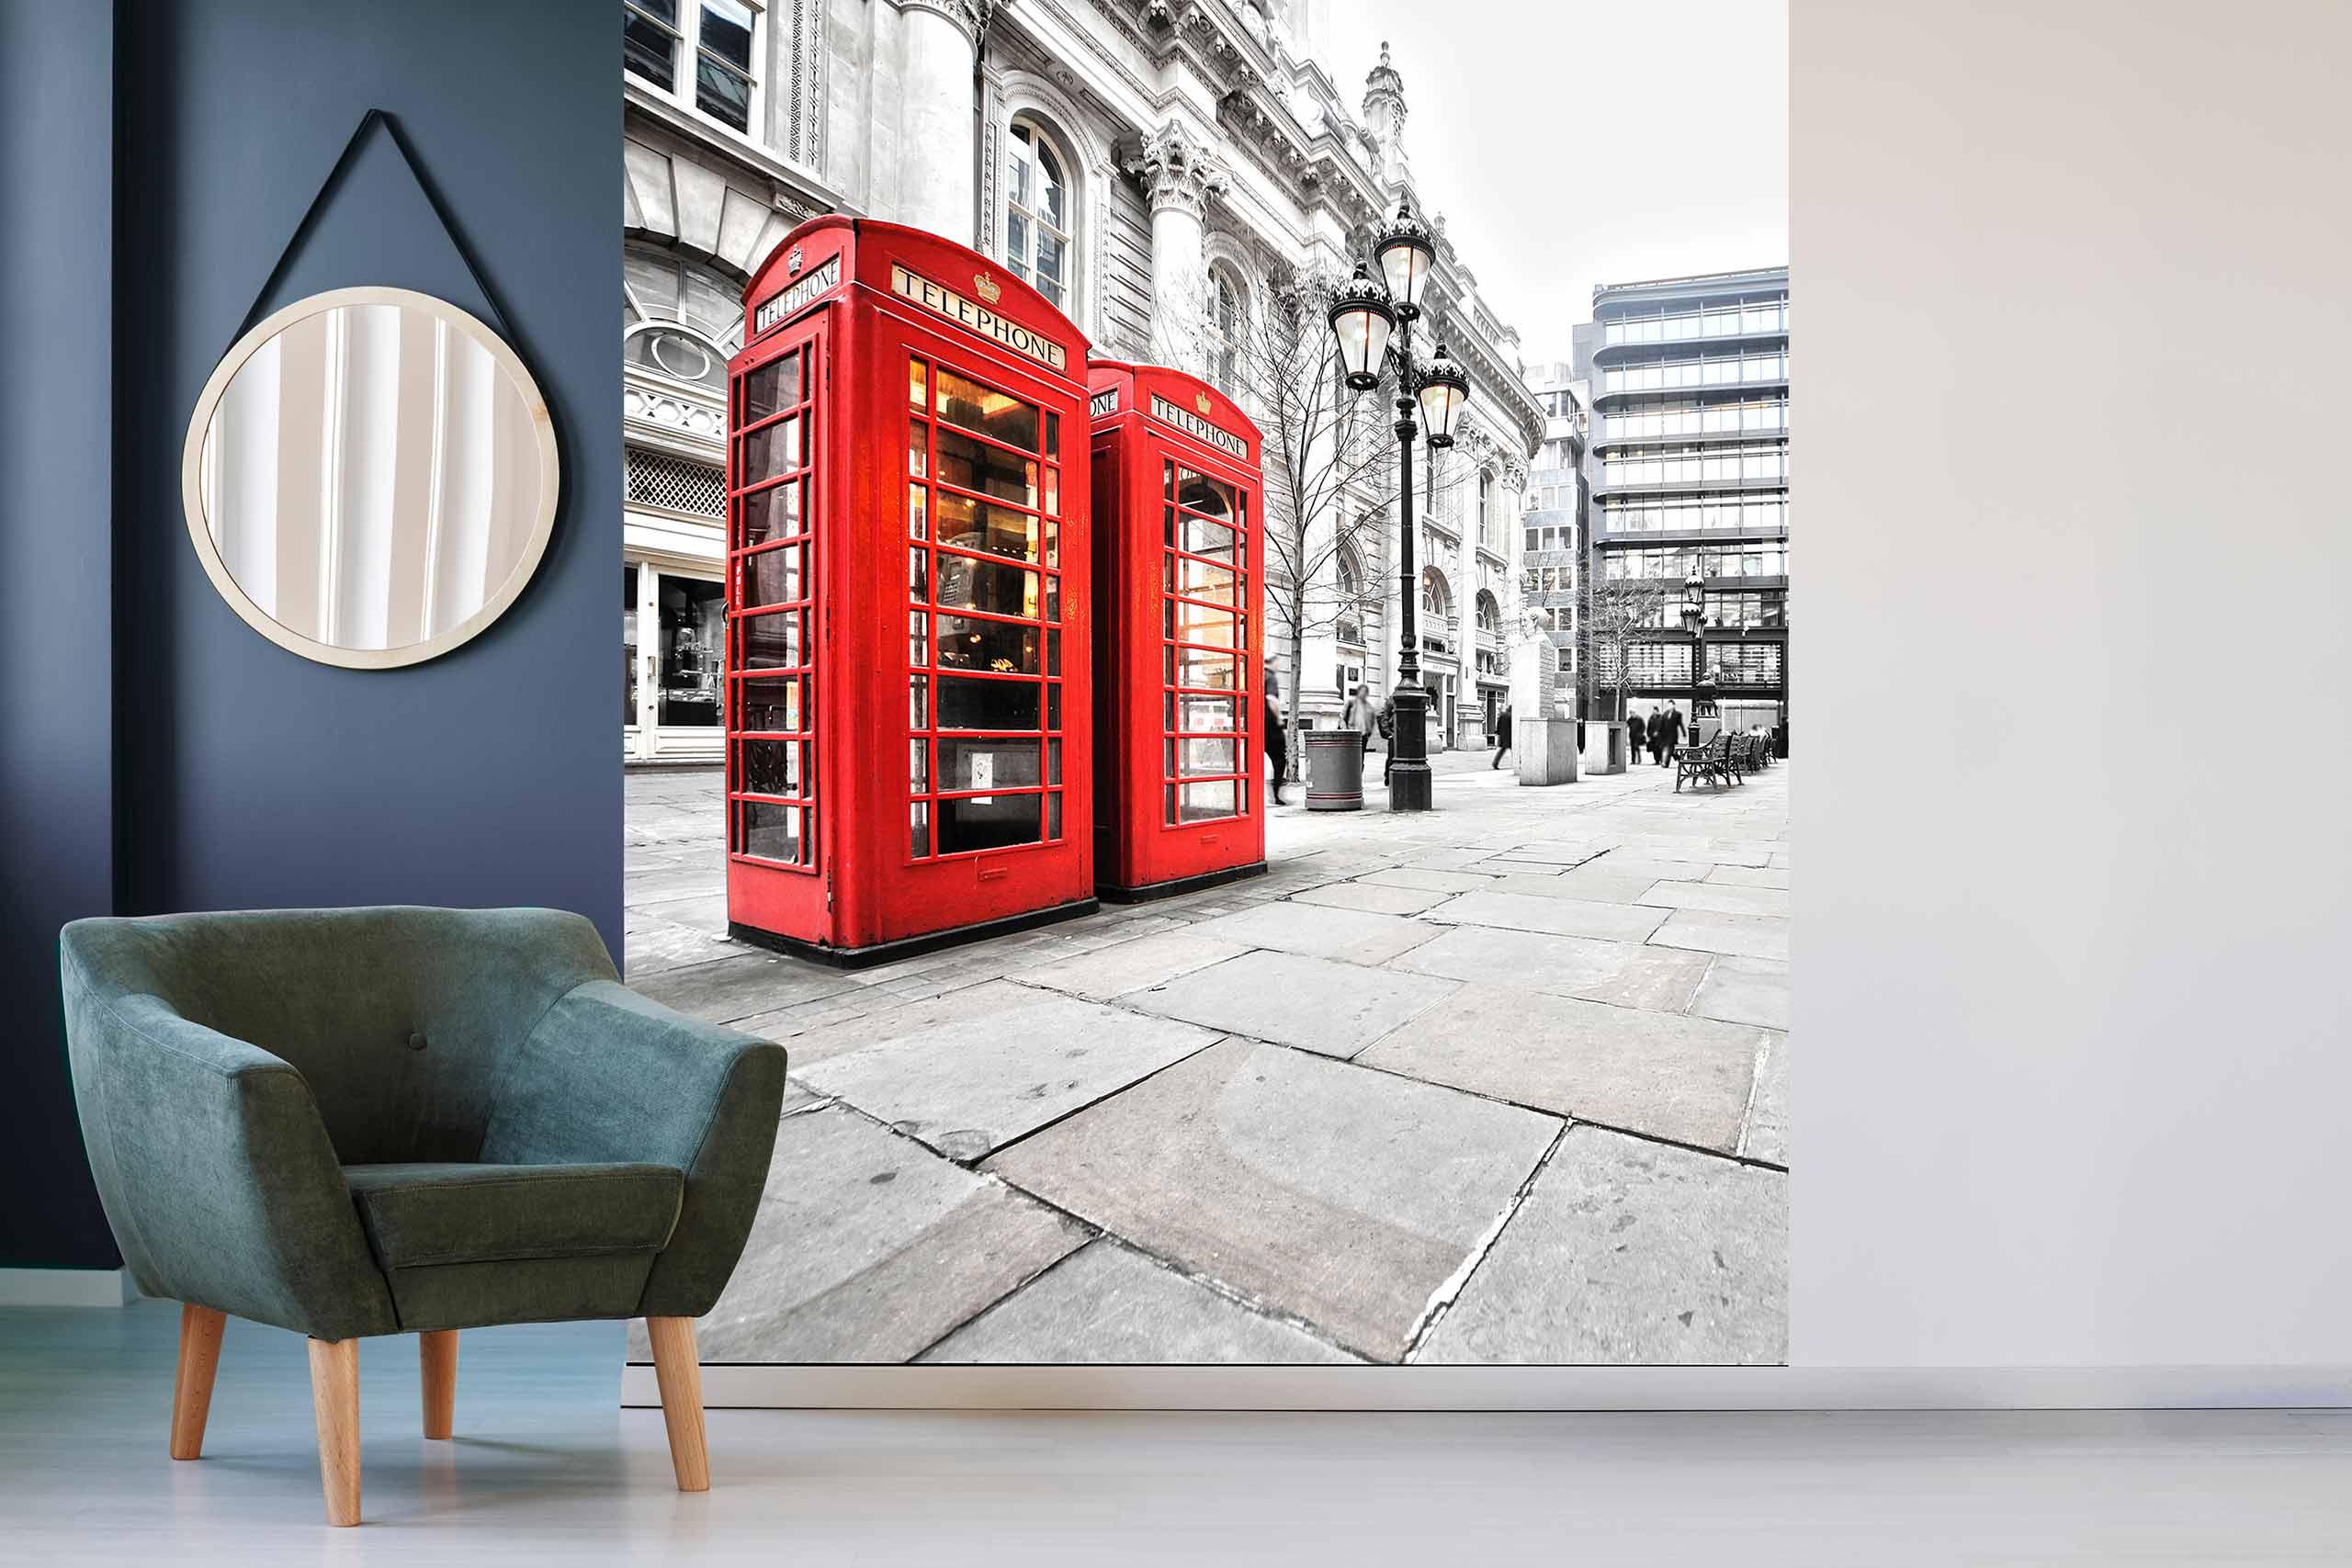 Vlies Tapete 225 Fototapete Höhe 250cm Motiv 05 London Telephone Booth